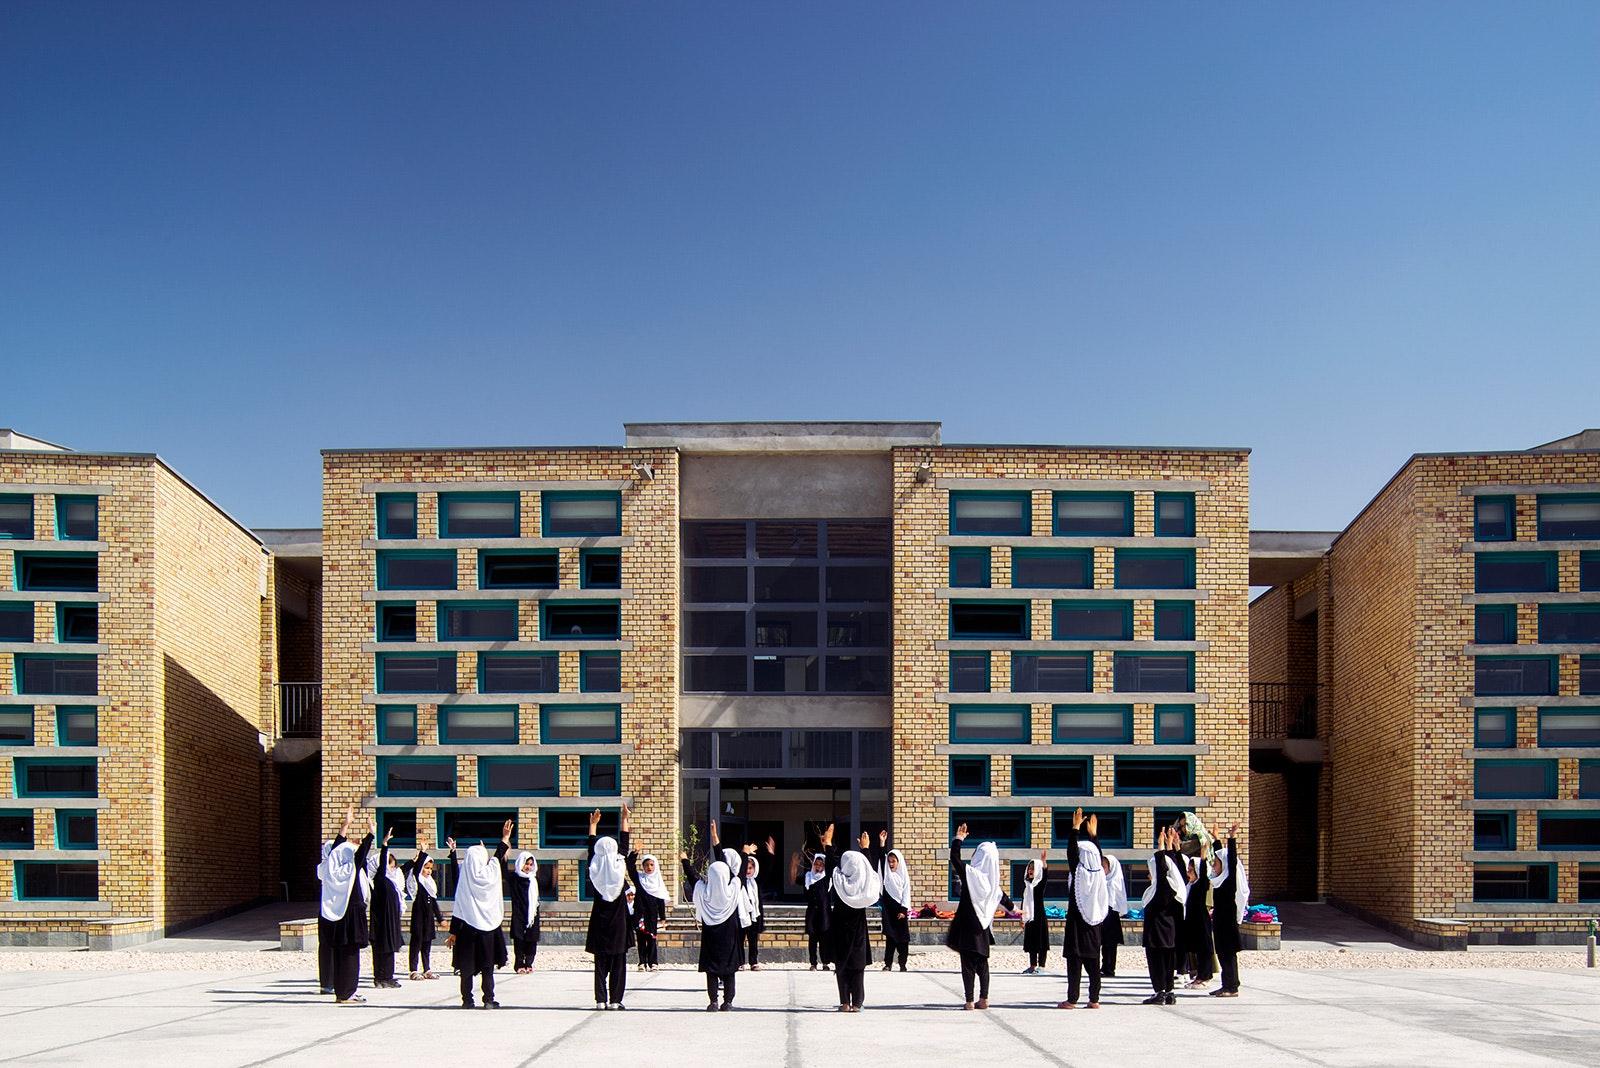 Gohar Khatoon Girlsu0027 School; Mazar I Sharif, Afghanistan By Robert Hull,  FAIA, And The University Of Washington, Department Of Architecture.